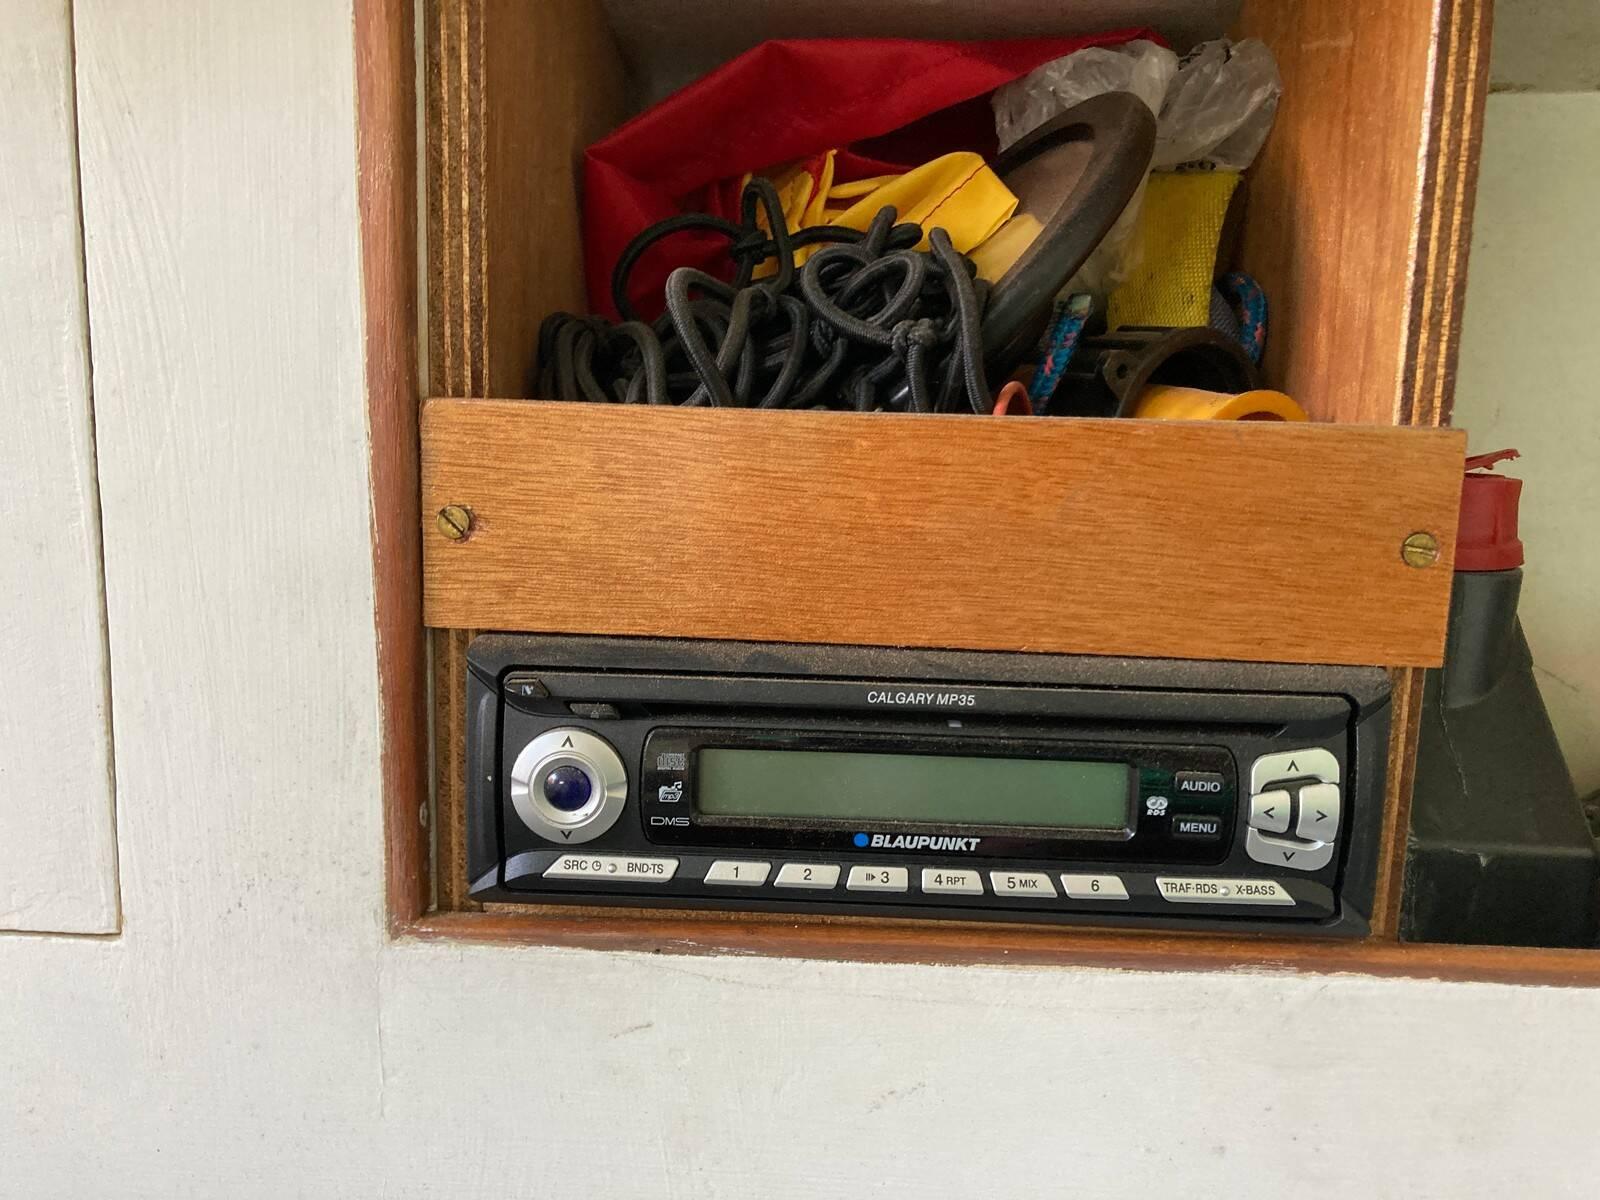 Twister 28 radio